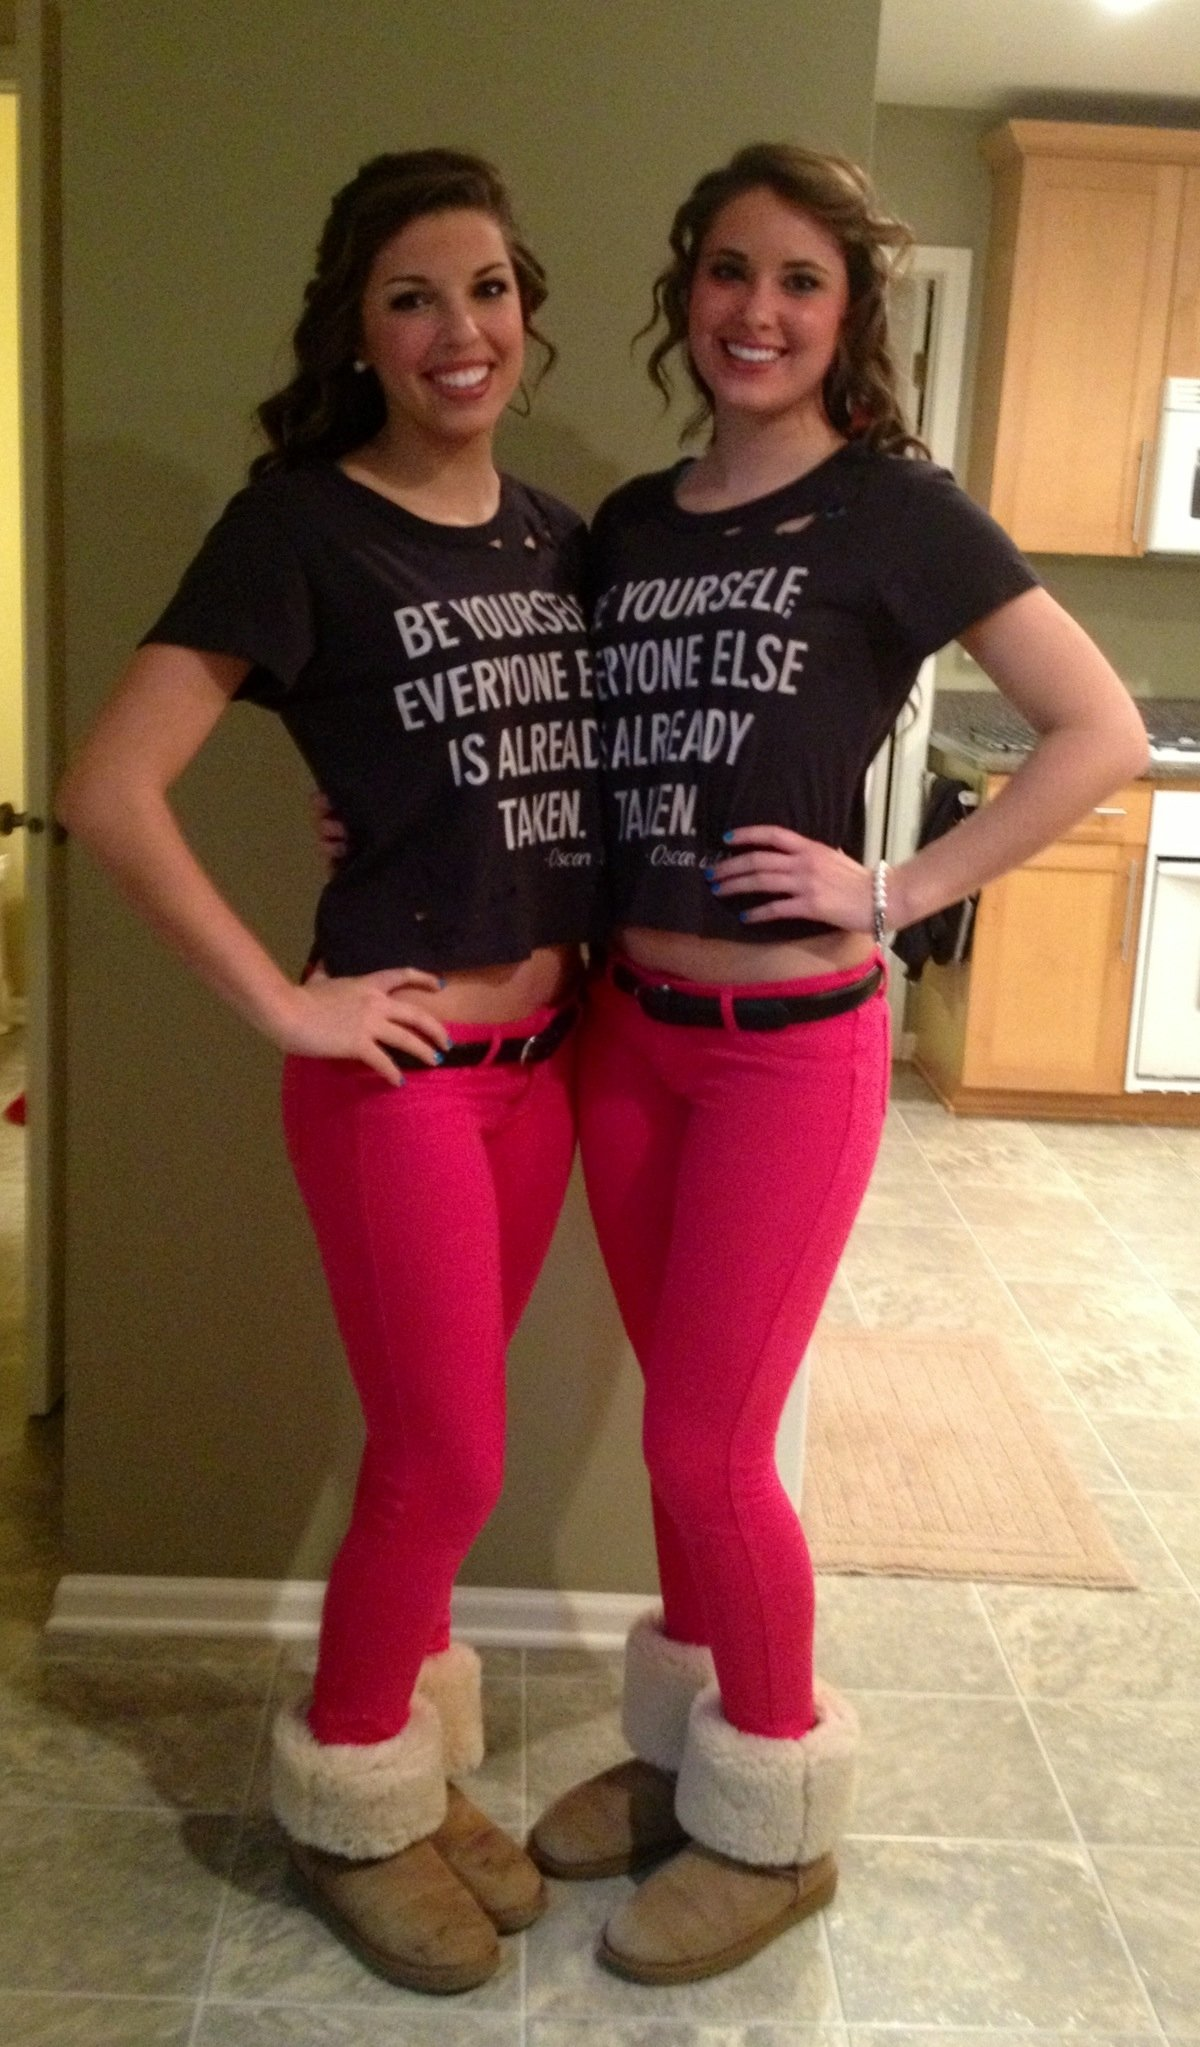 10 Spectacular Halloween Costume Ideas For 3 best friend twins 3 funny halloween costumes funny stuff 16 2020